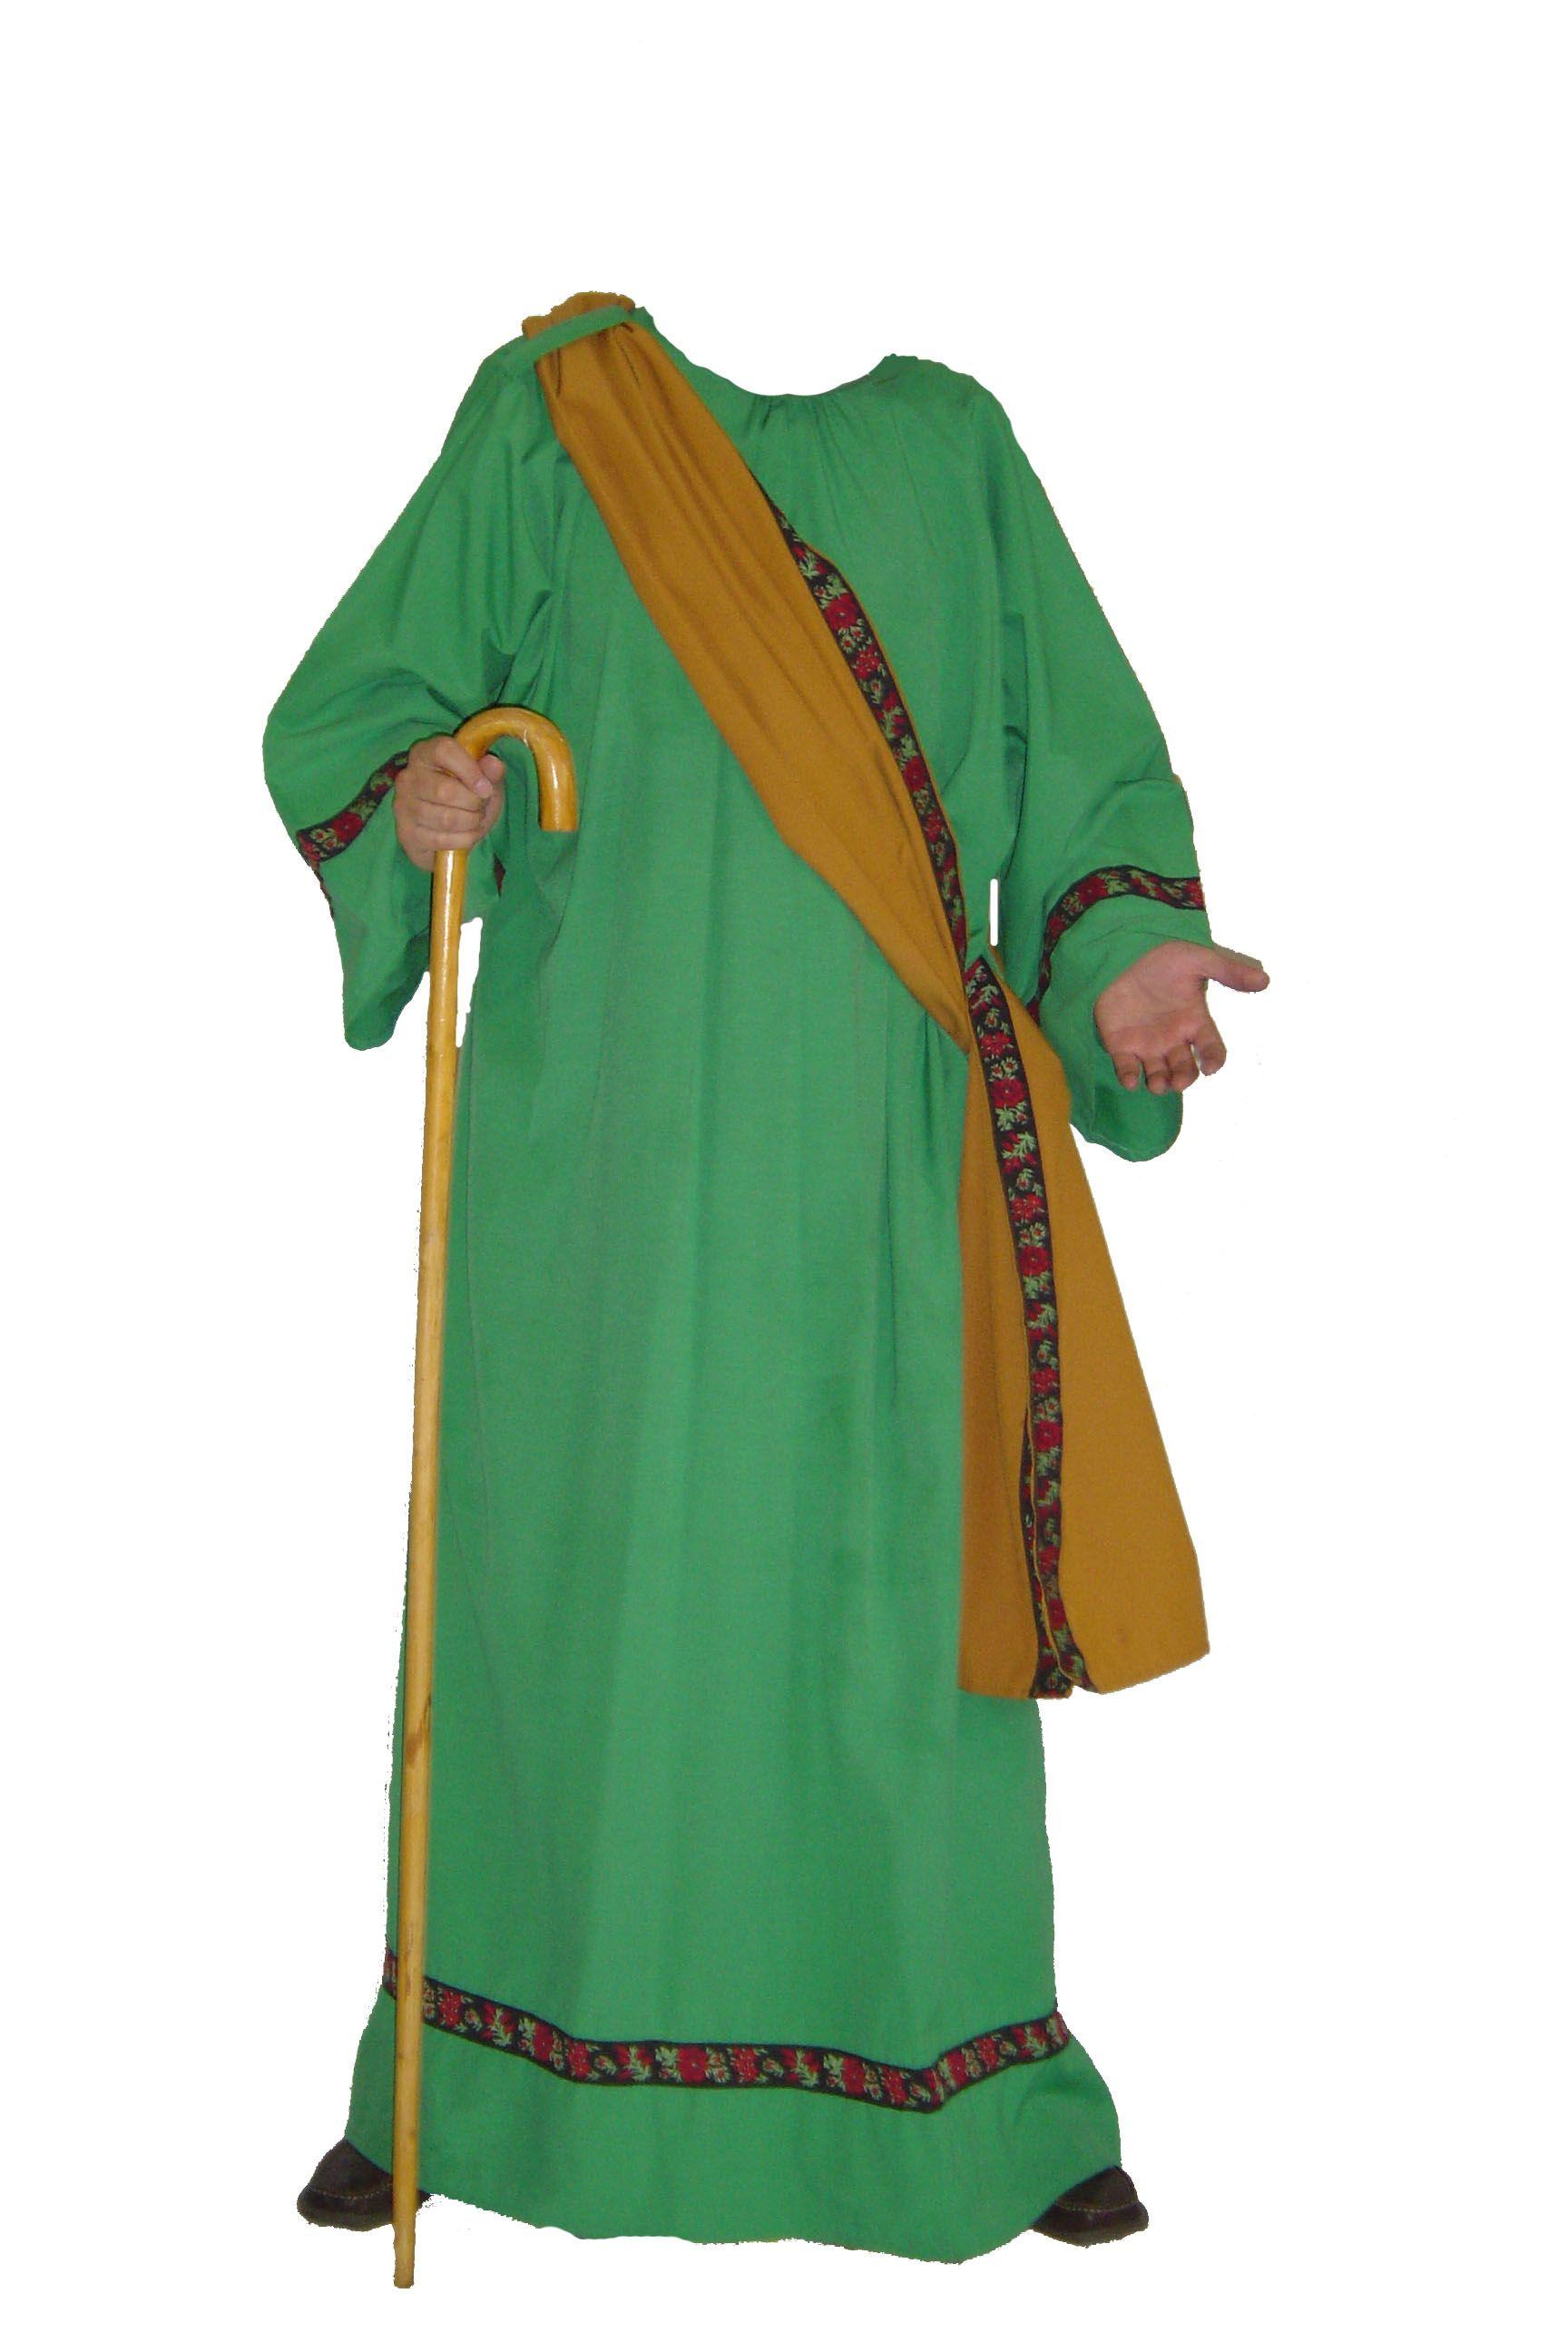 Kids Biblical Shepherd Costume Boys Christmas Clothing Impulse